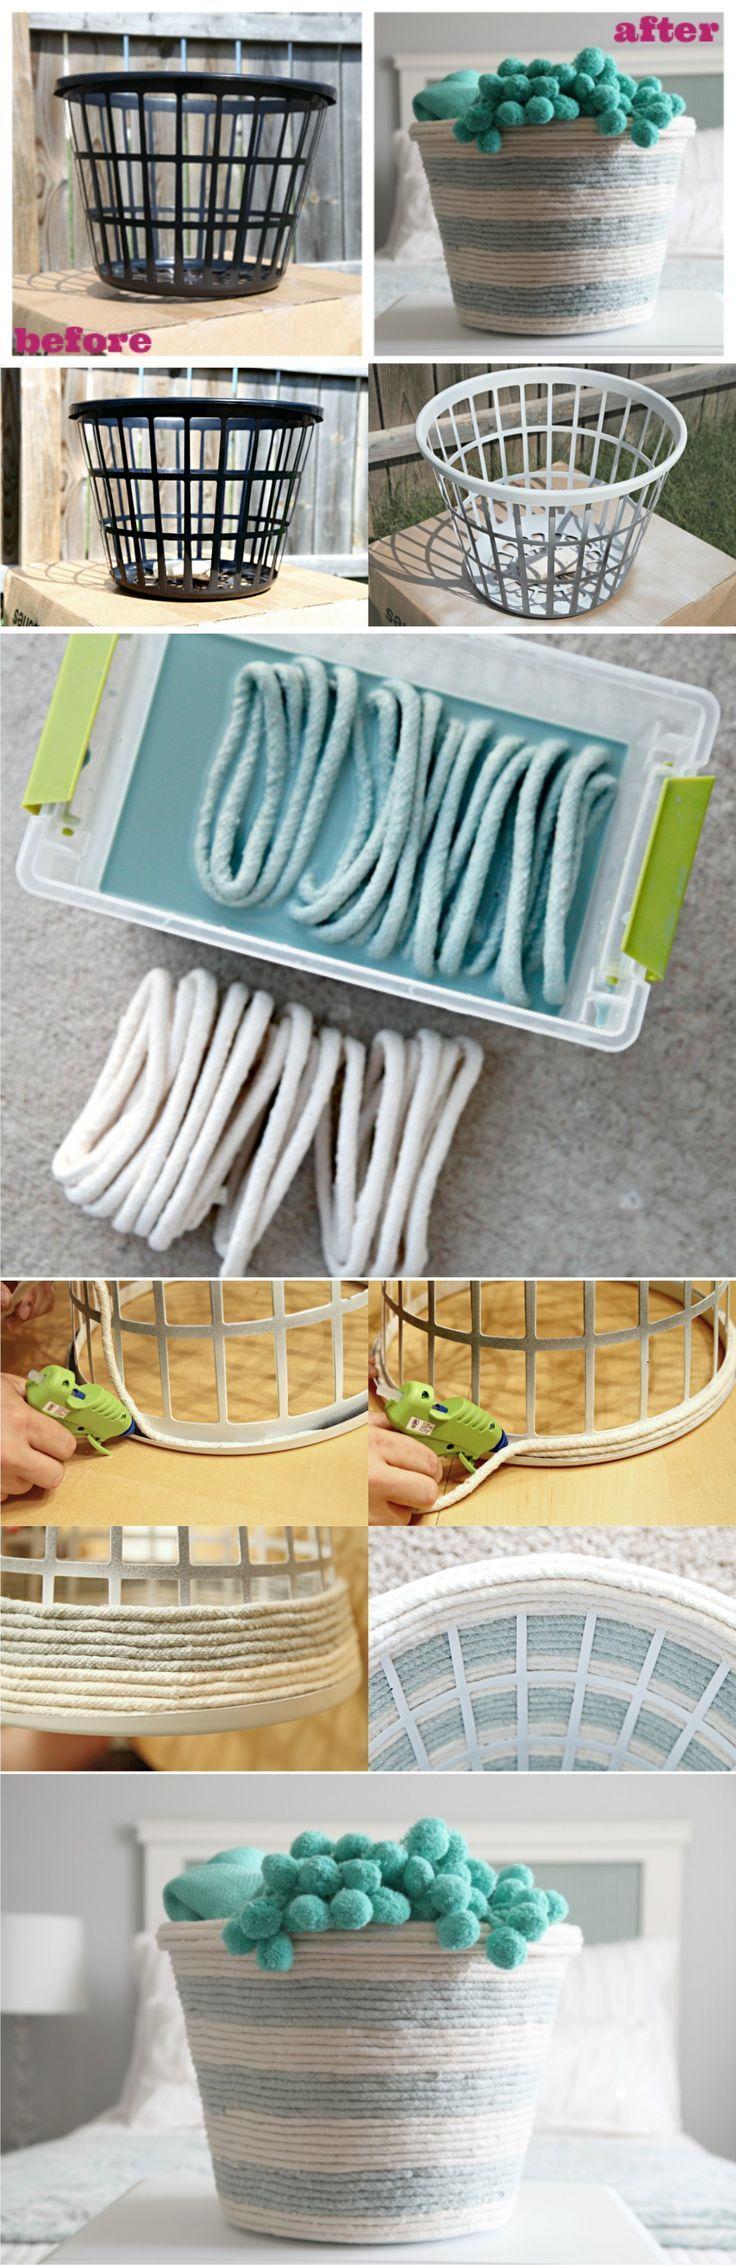 Cesta DIY con cuerda / Vía iheartorganizing.blogspot.com: